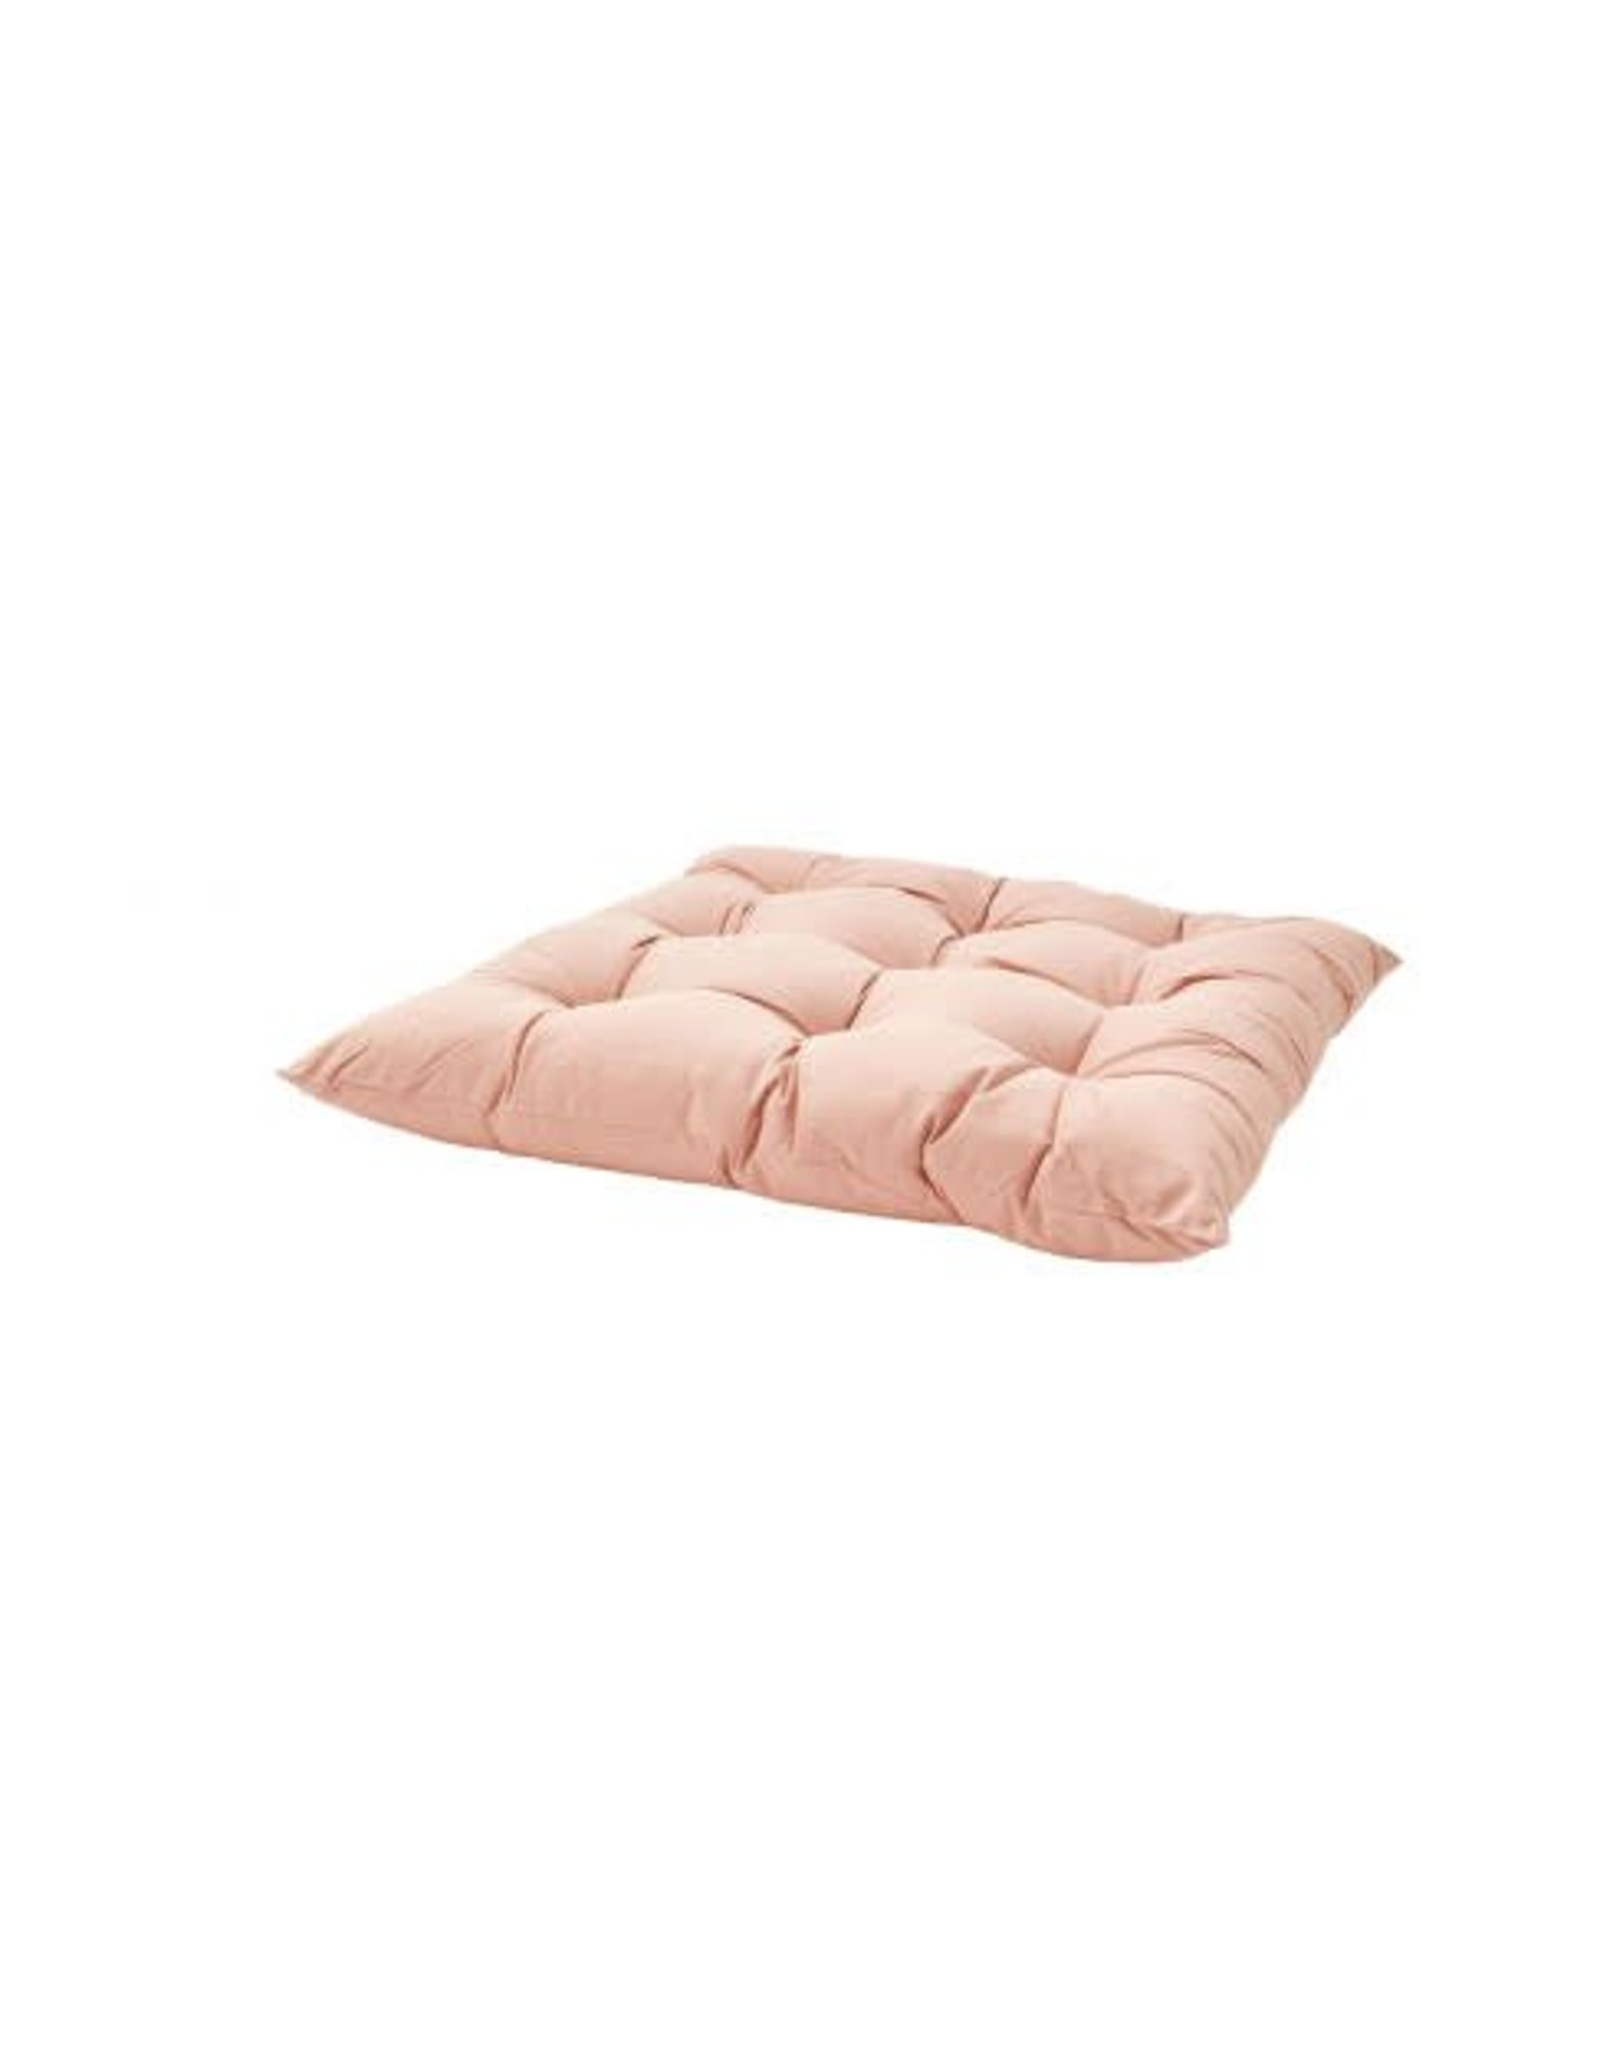 KIDS CONCEPT Apricot Floor Cushion